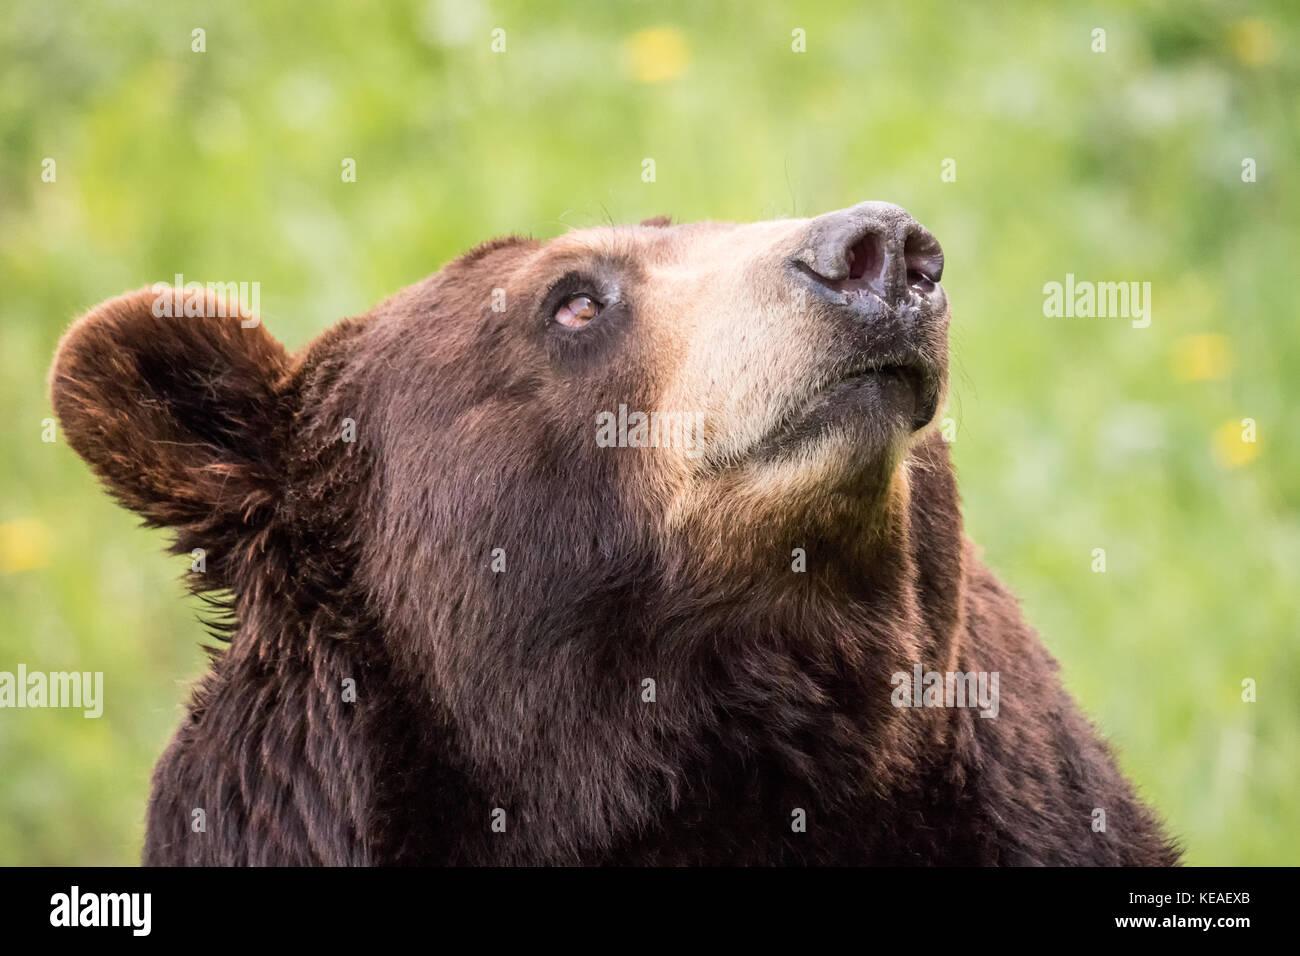 Portrait of a Black Bear in a meadow near Bozeman, Montana, USA.  Captive animal. - Stock Image